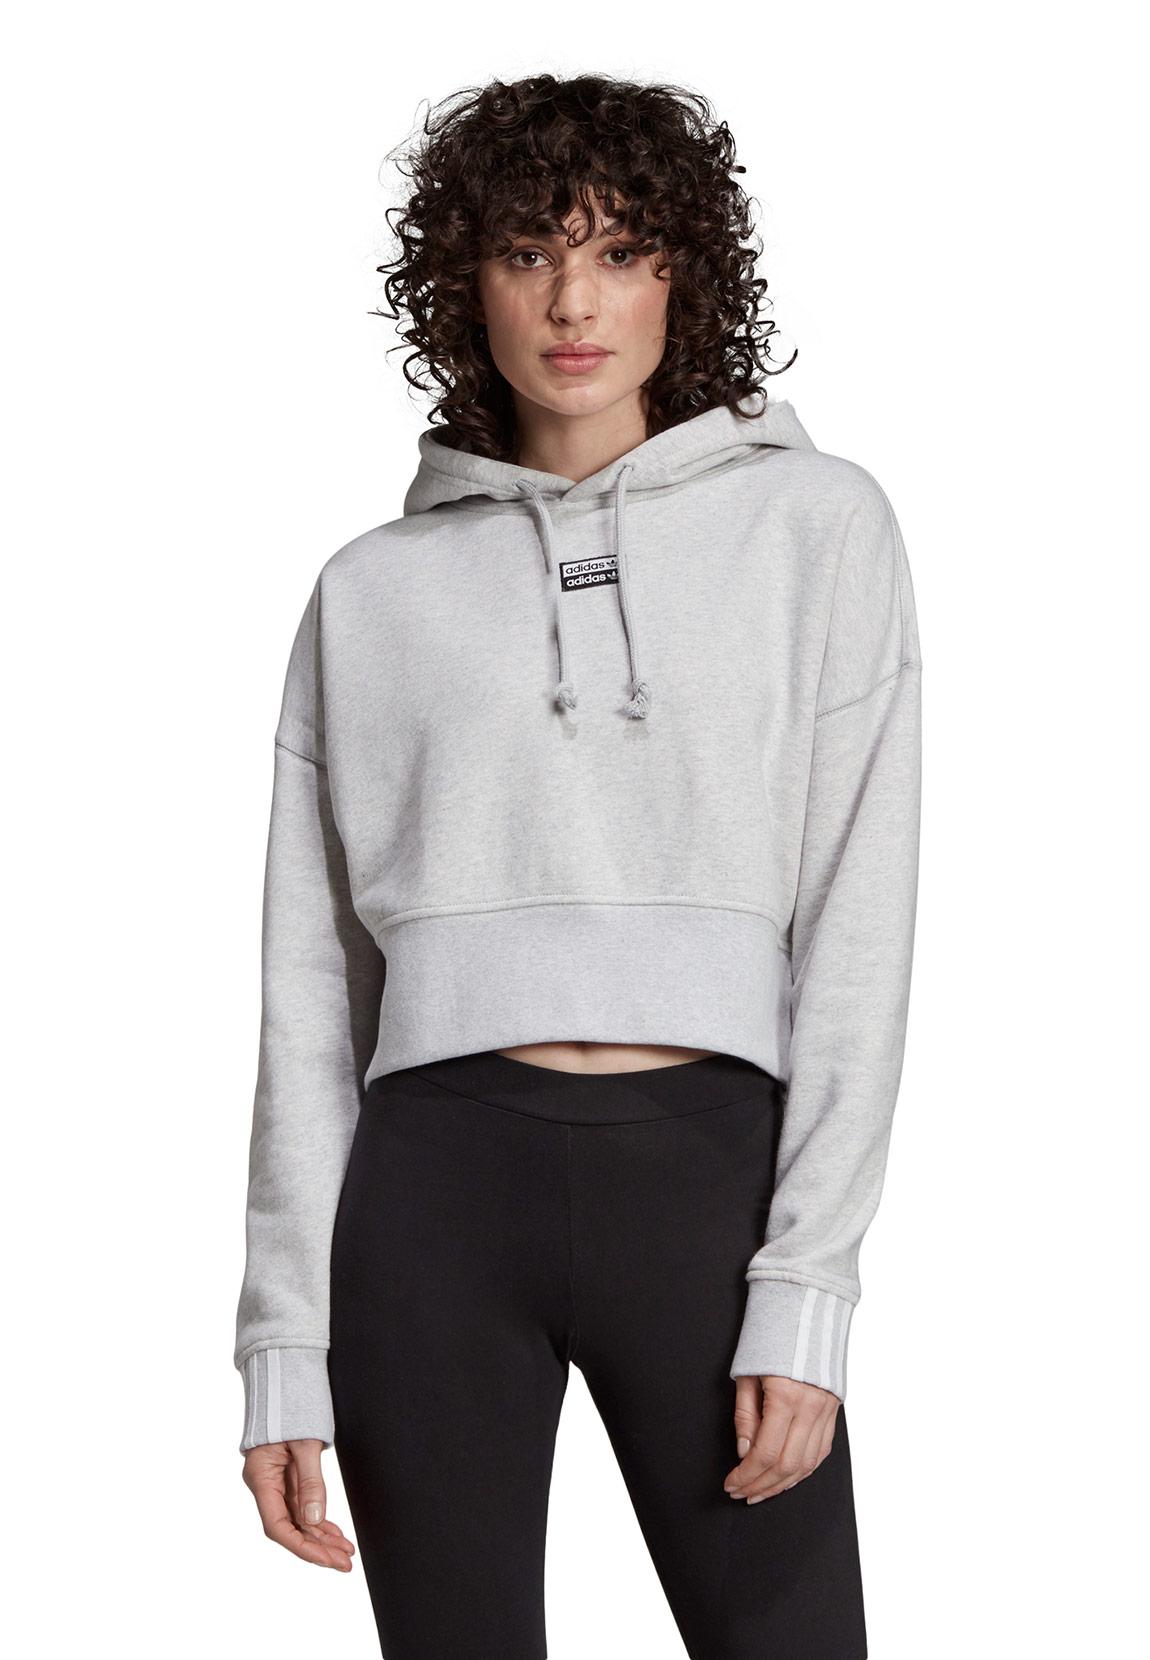 Details about Adidas Originals Hoody Ladies Vocal Crop Hood EJ8537 Black